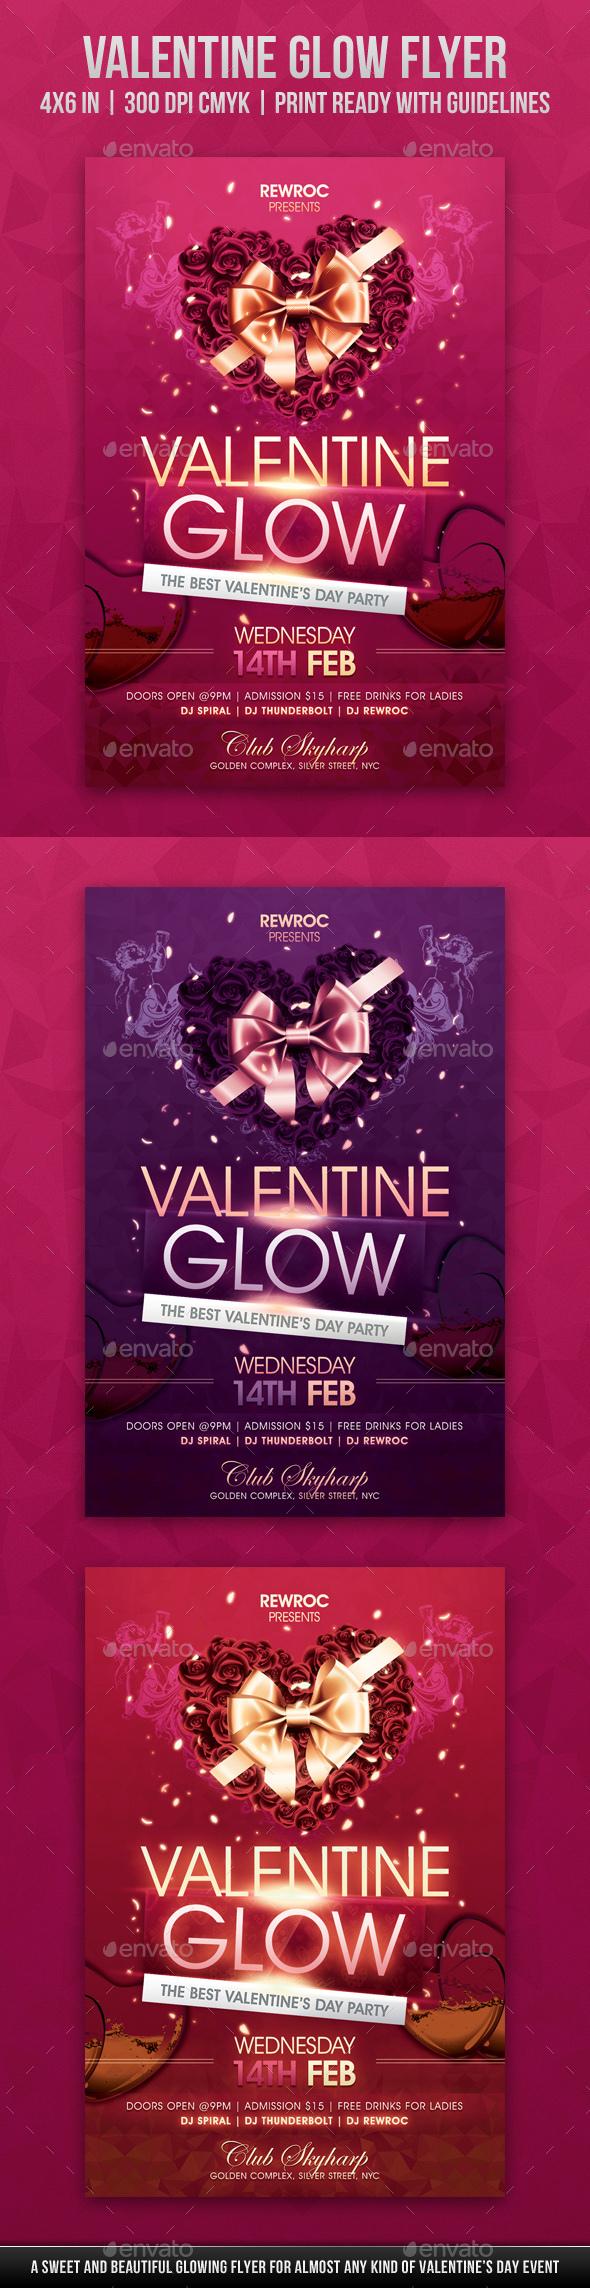 Valentine Glow Flyer - Holidays Events